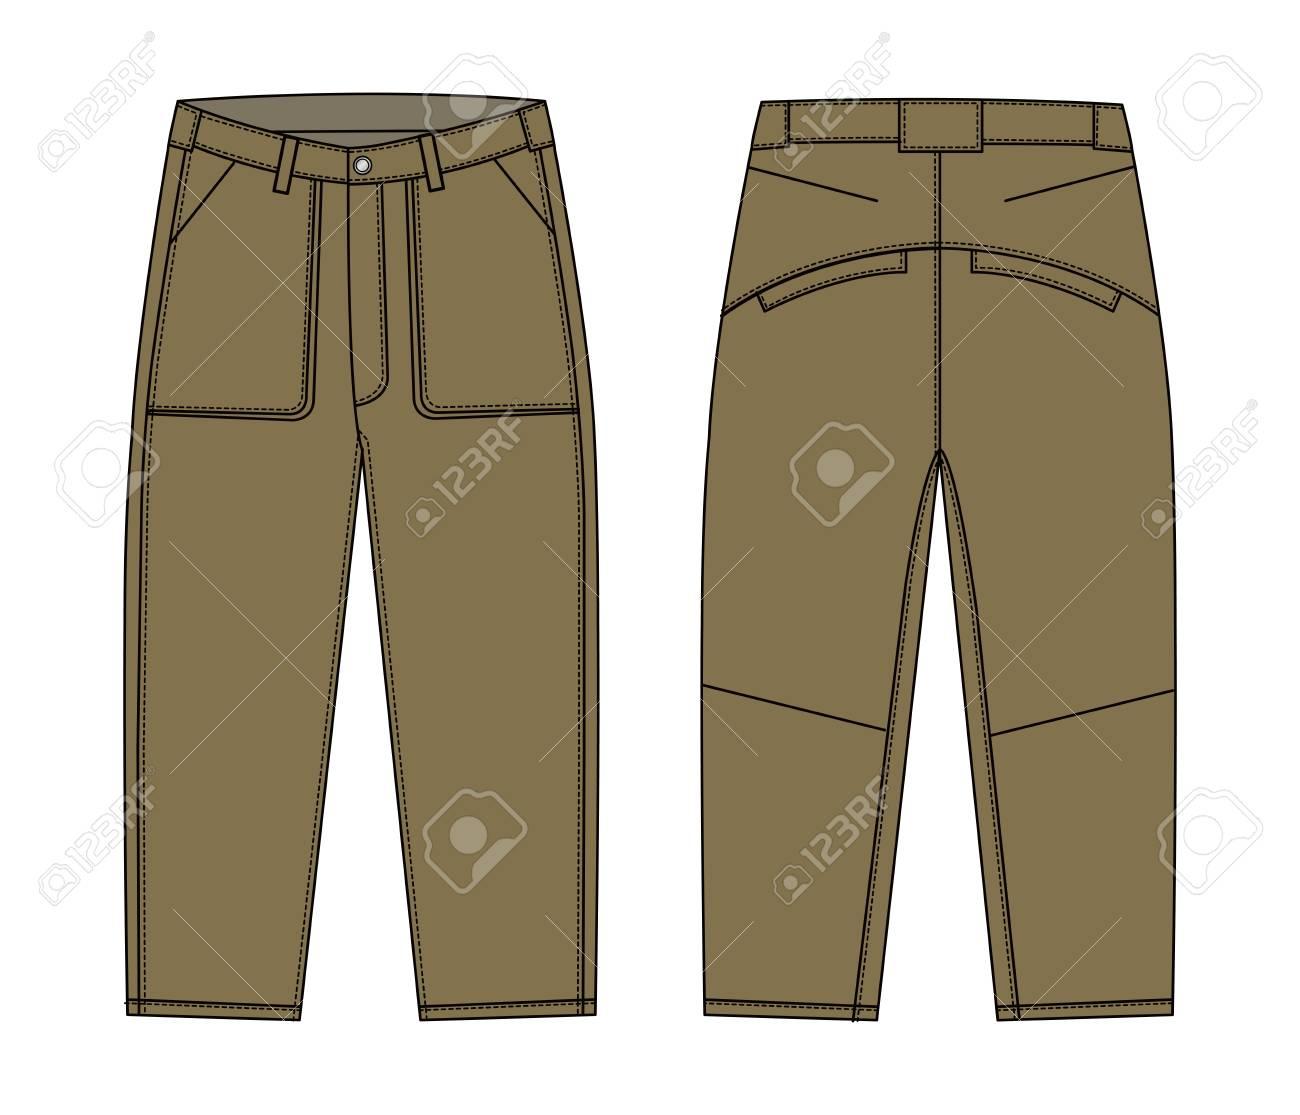 Illustration Of Menu0027s Cargo Pants St-Illustration of menu0027s cargo pants Stock Vector - 91808701-16